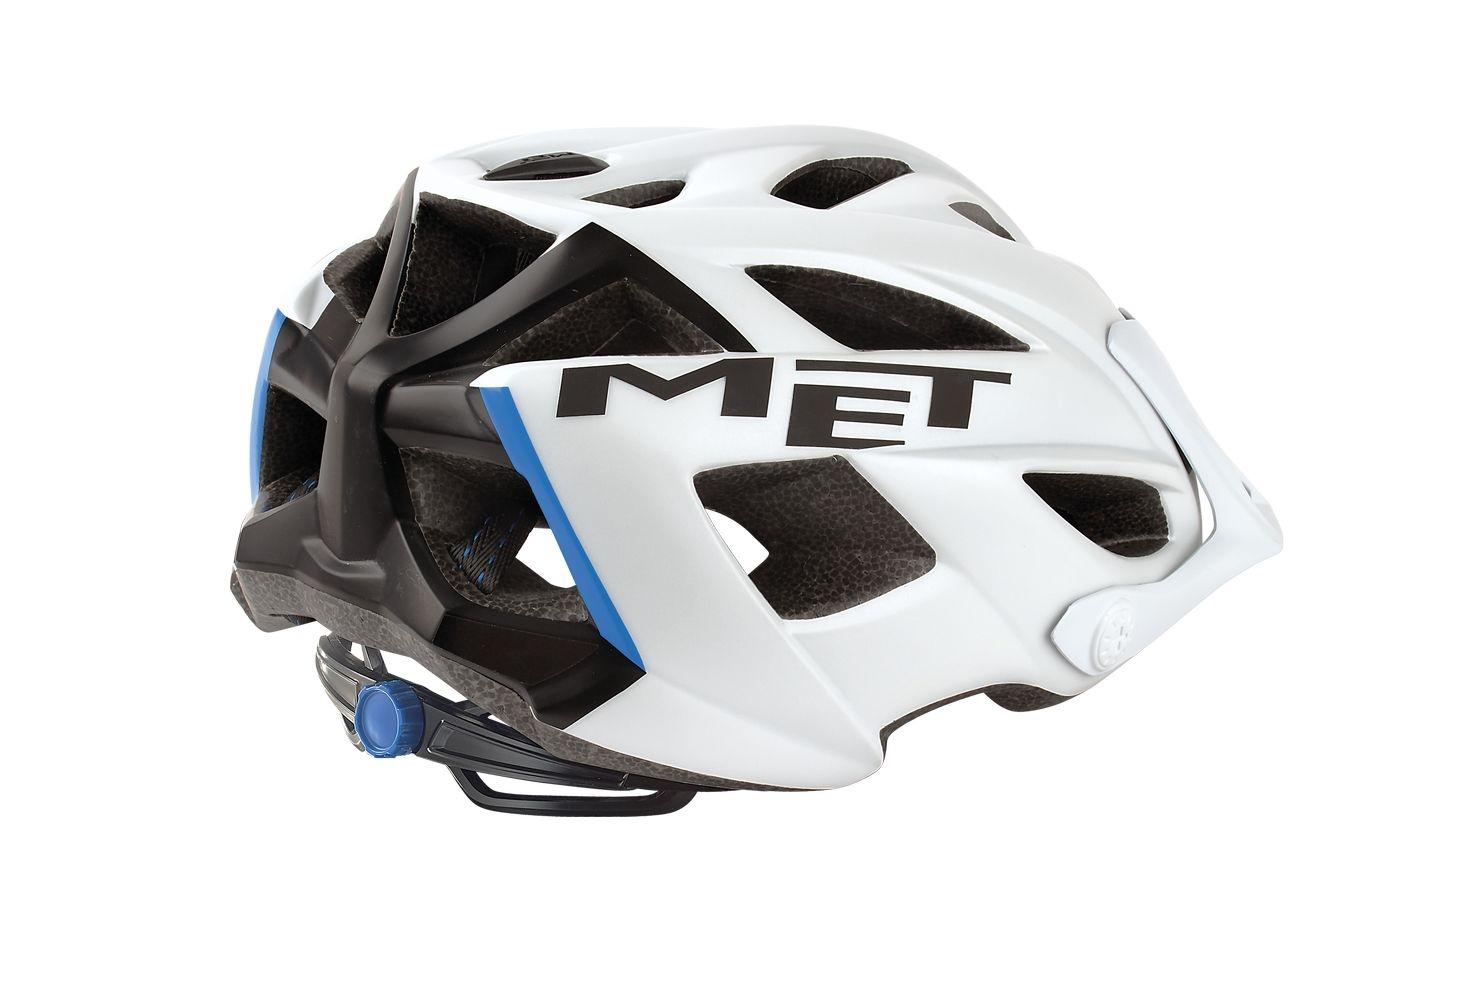 Casque MET Terra Safe-T Duo Blanc/Noir mat